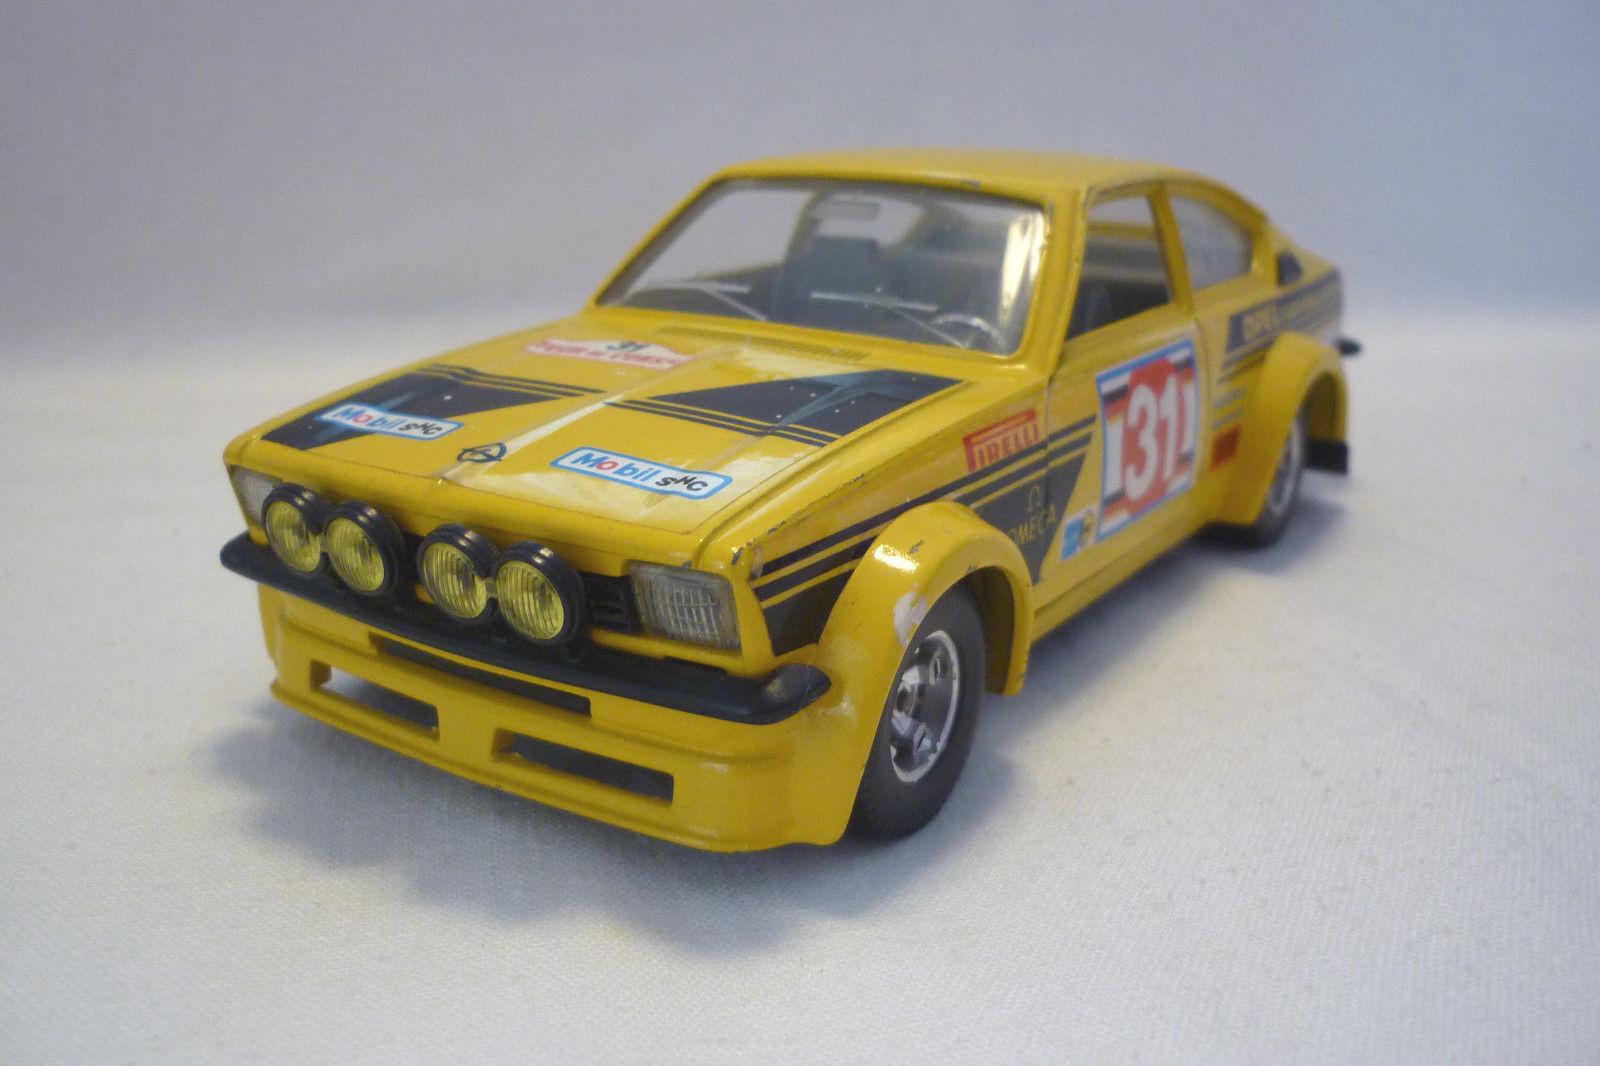 Bburago - Modéle en Métal - Opel Kadett Gt    E Course - 1 24 - (5.DIV-27)  mieux acheter